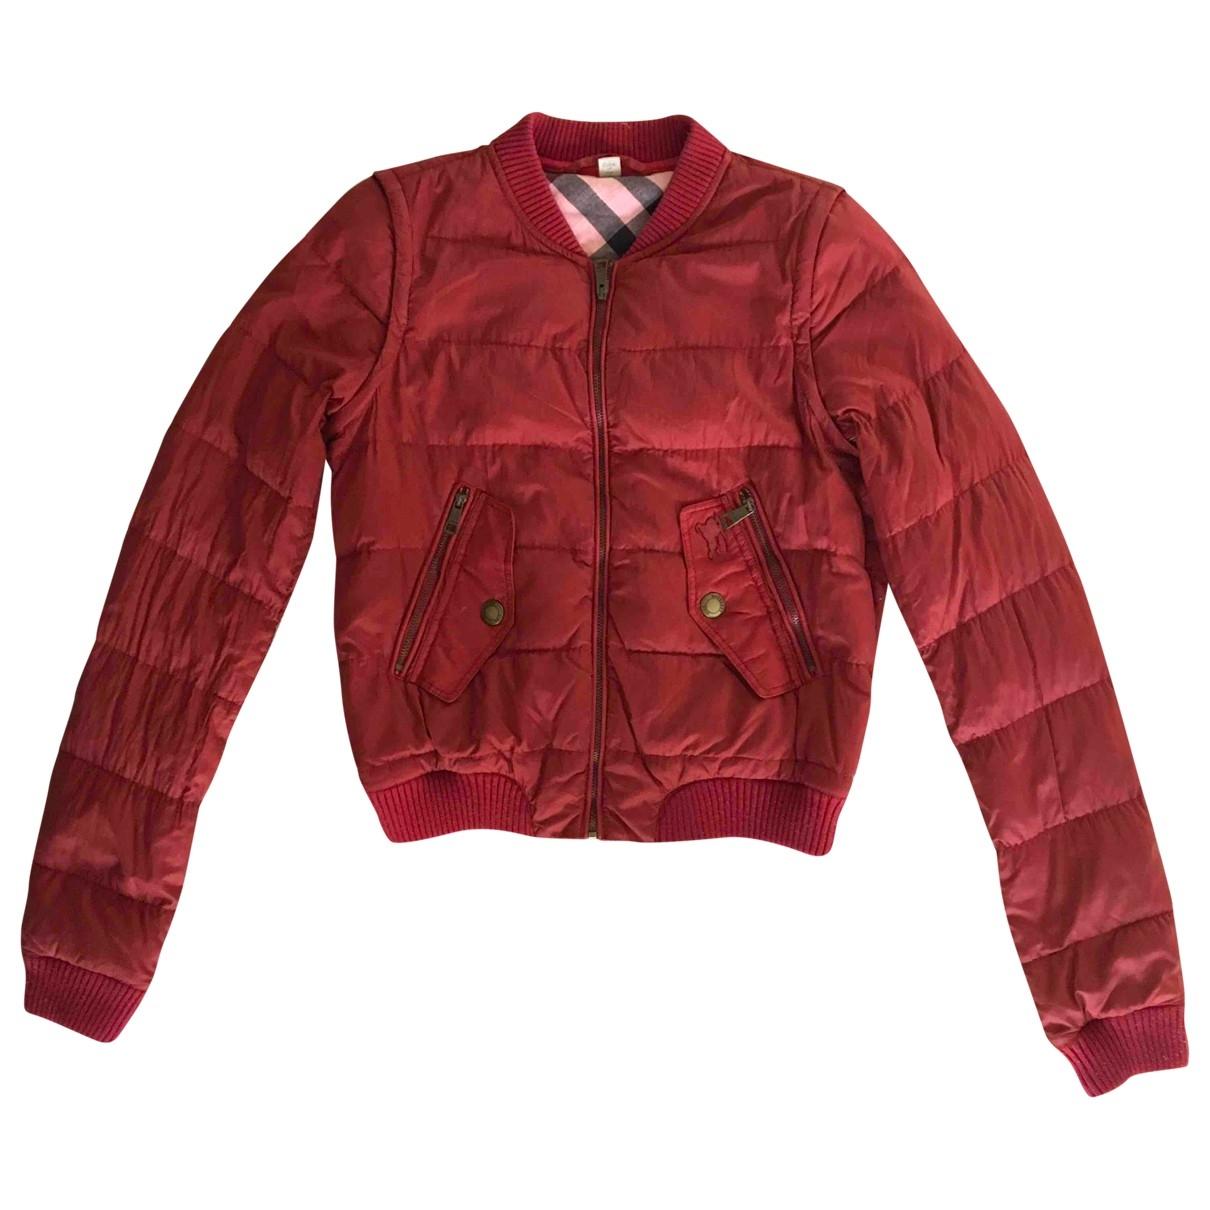 Burberry \N Red coat for Women XS International